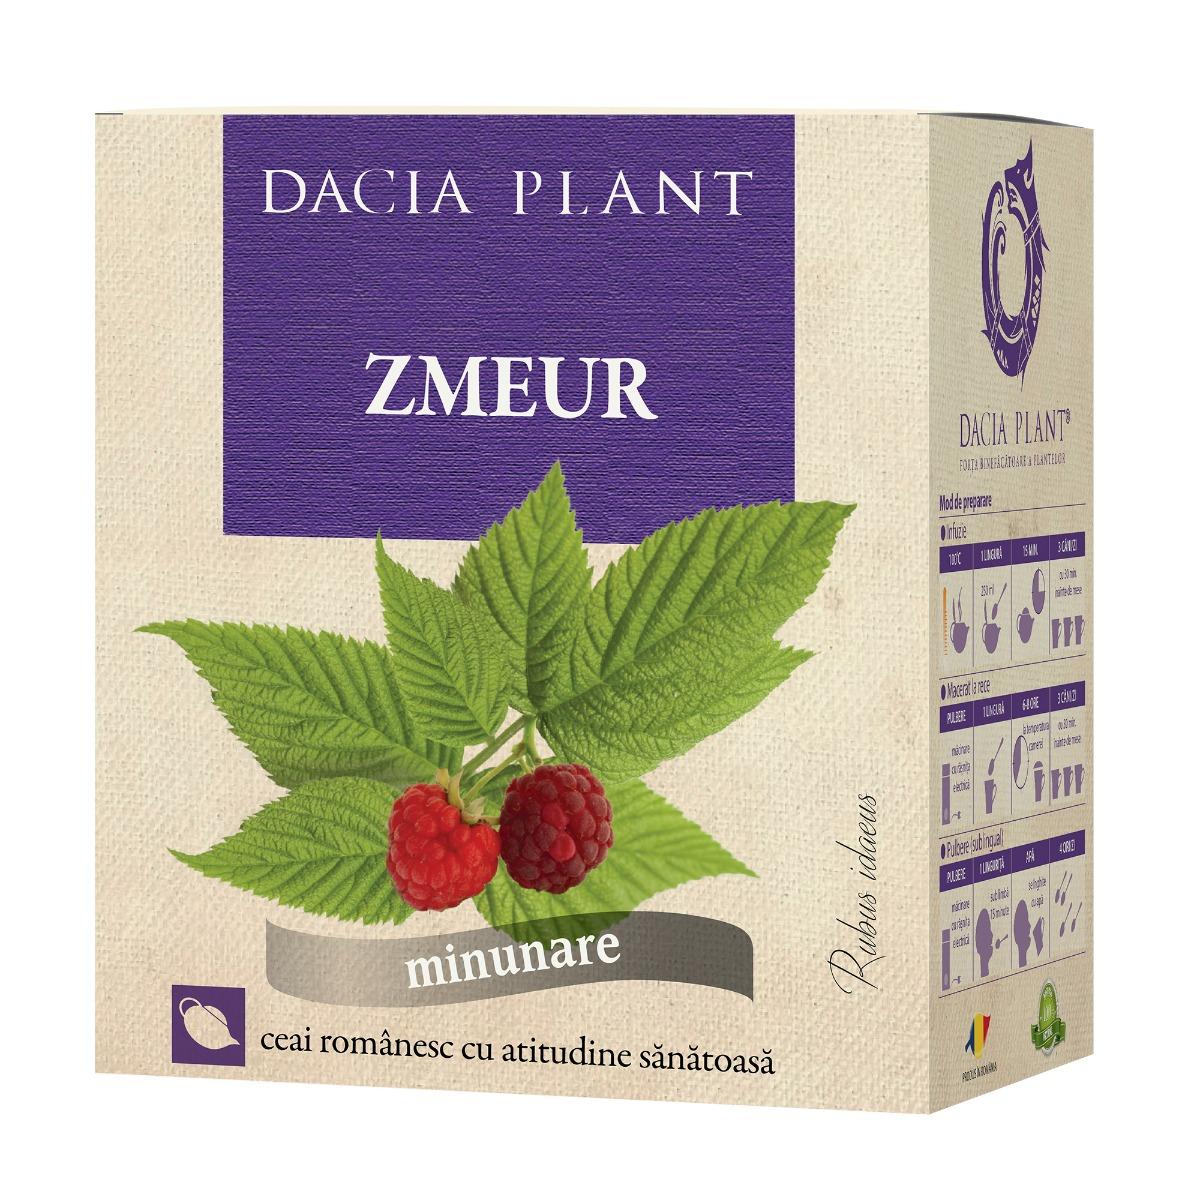 Ceai de zmeur, 50g, Dacia Plant drmax.ro